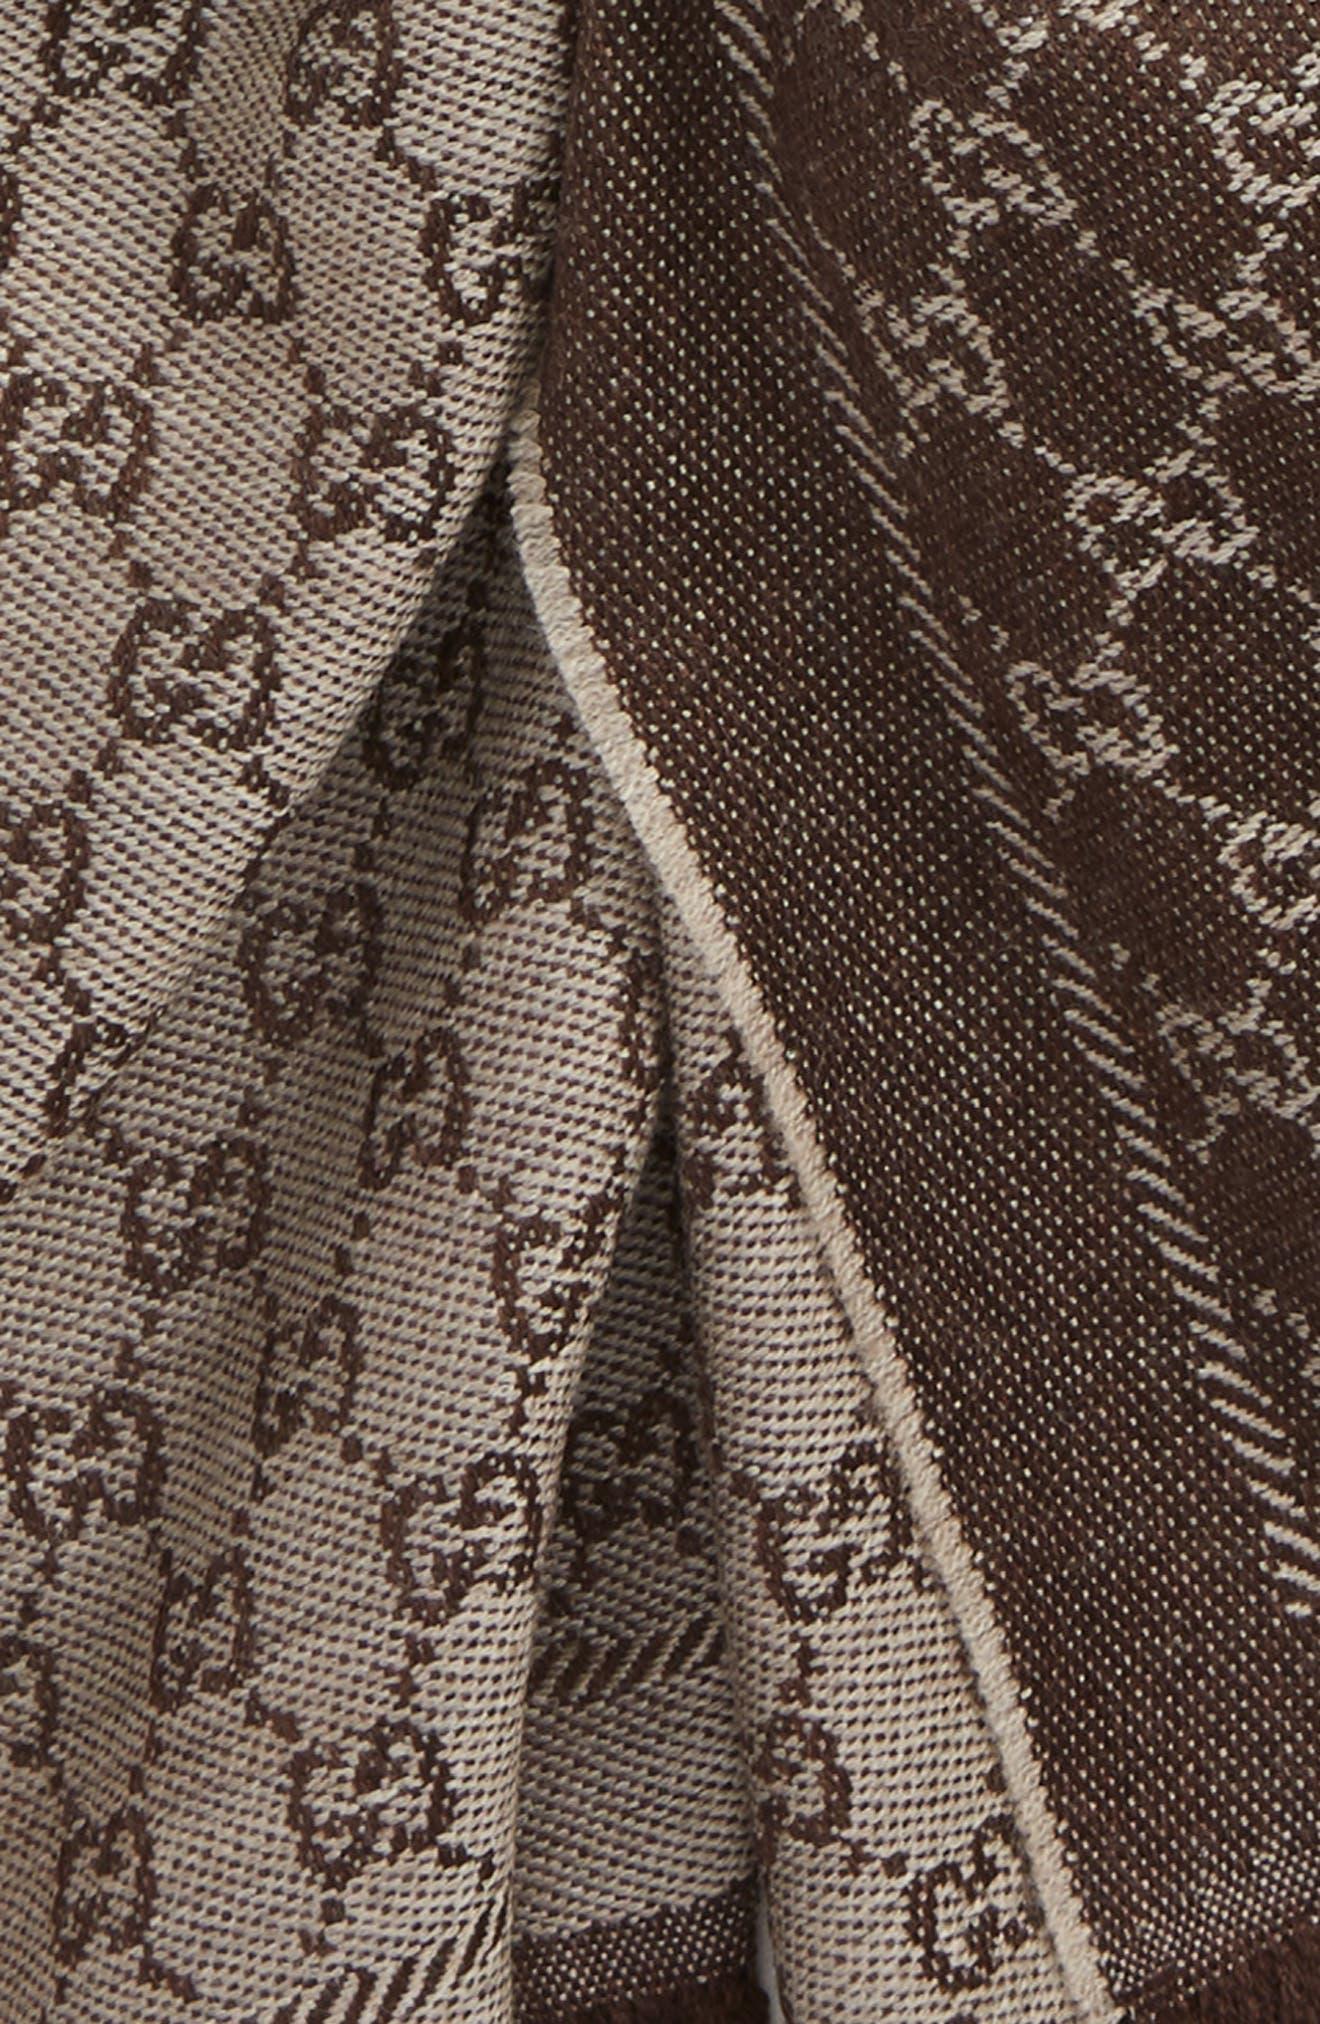 GG Jacquard Wool Scarf,                             Alternate thumbnail 3, color,                             BEIGE/ DARK BROWN